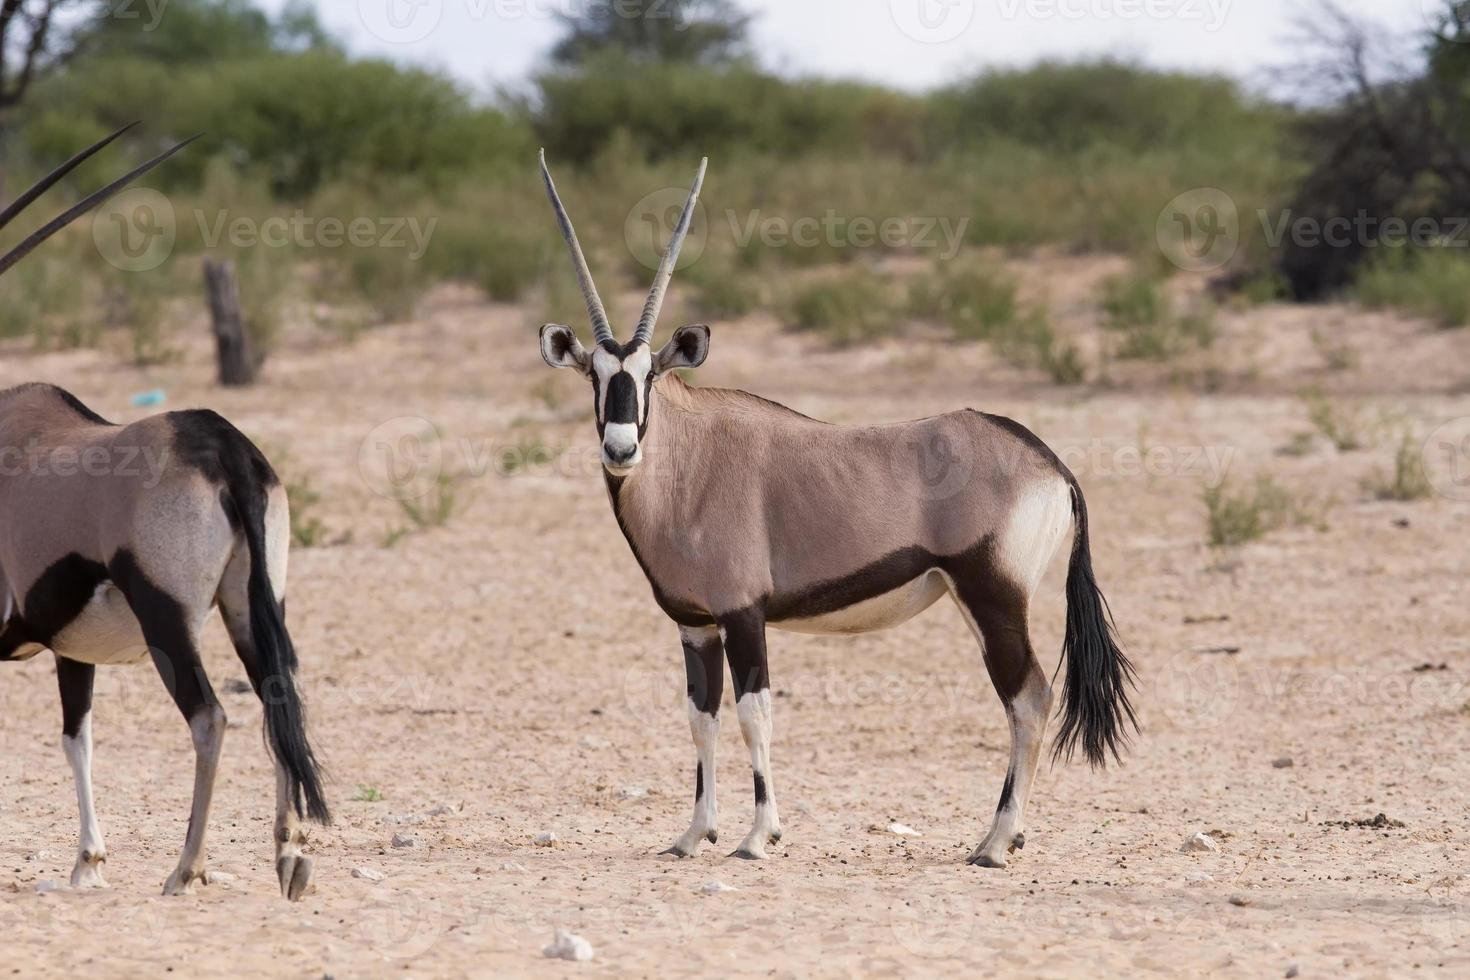 manada de oryx de pie sobre una llanura seca foto